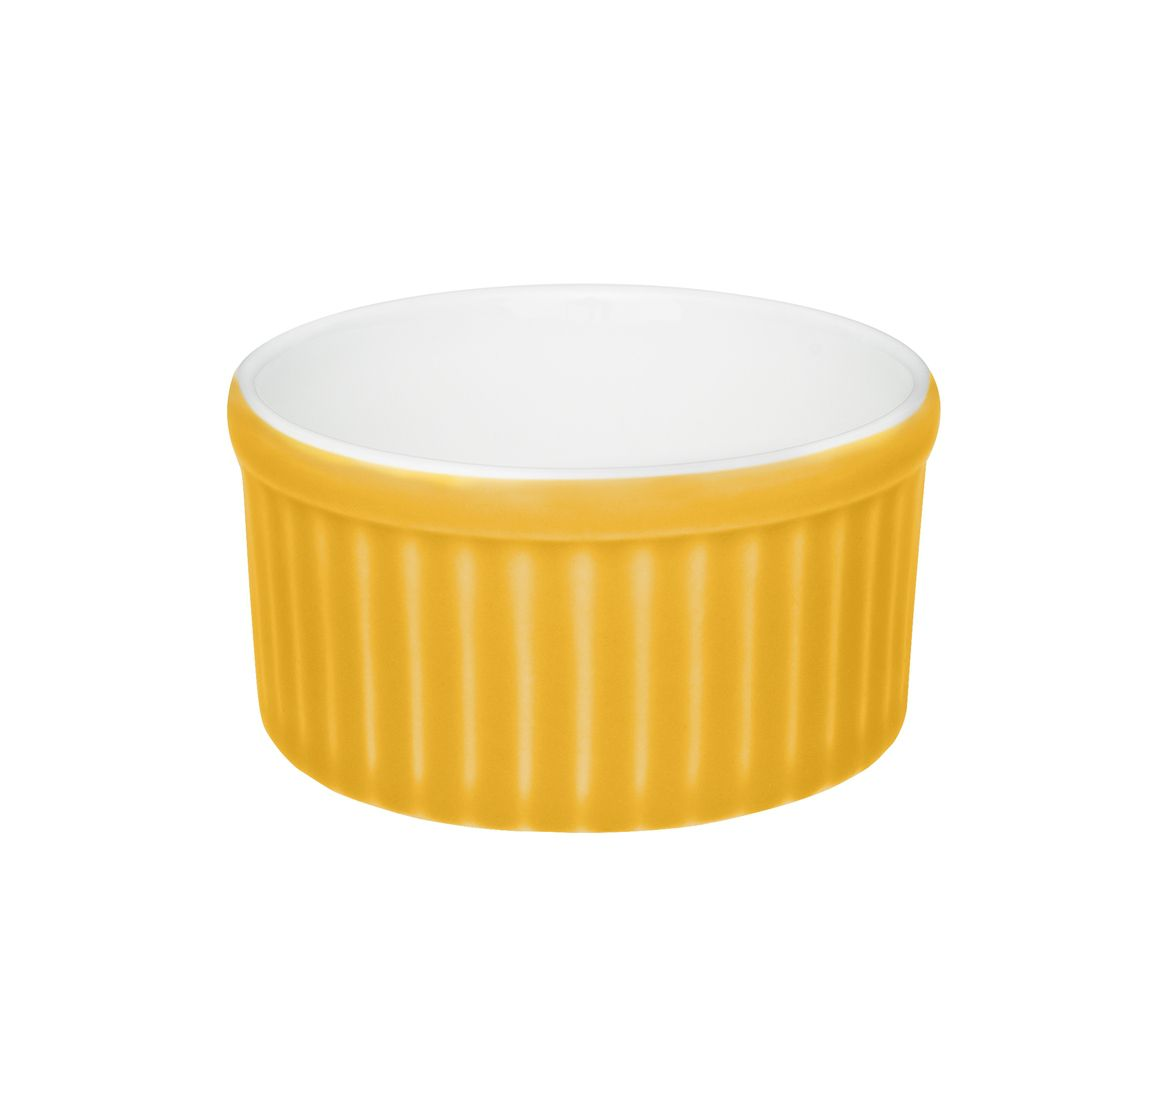 Tigela Ramequin 10X5Cm 180Ml - Branco/Amarelo - Oxford Cookware